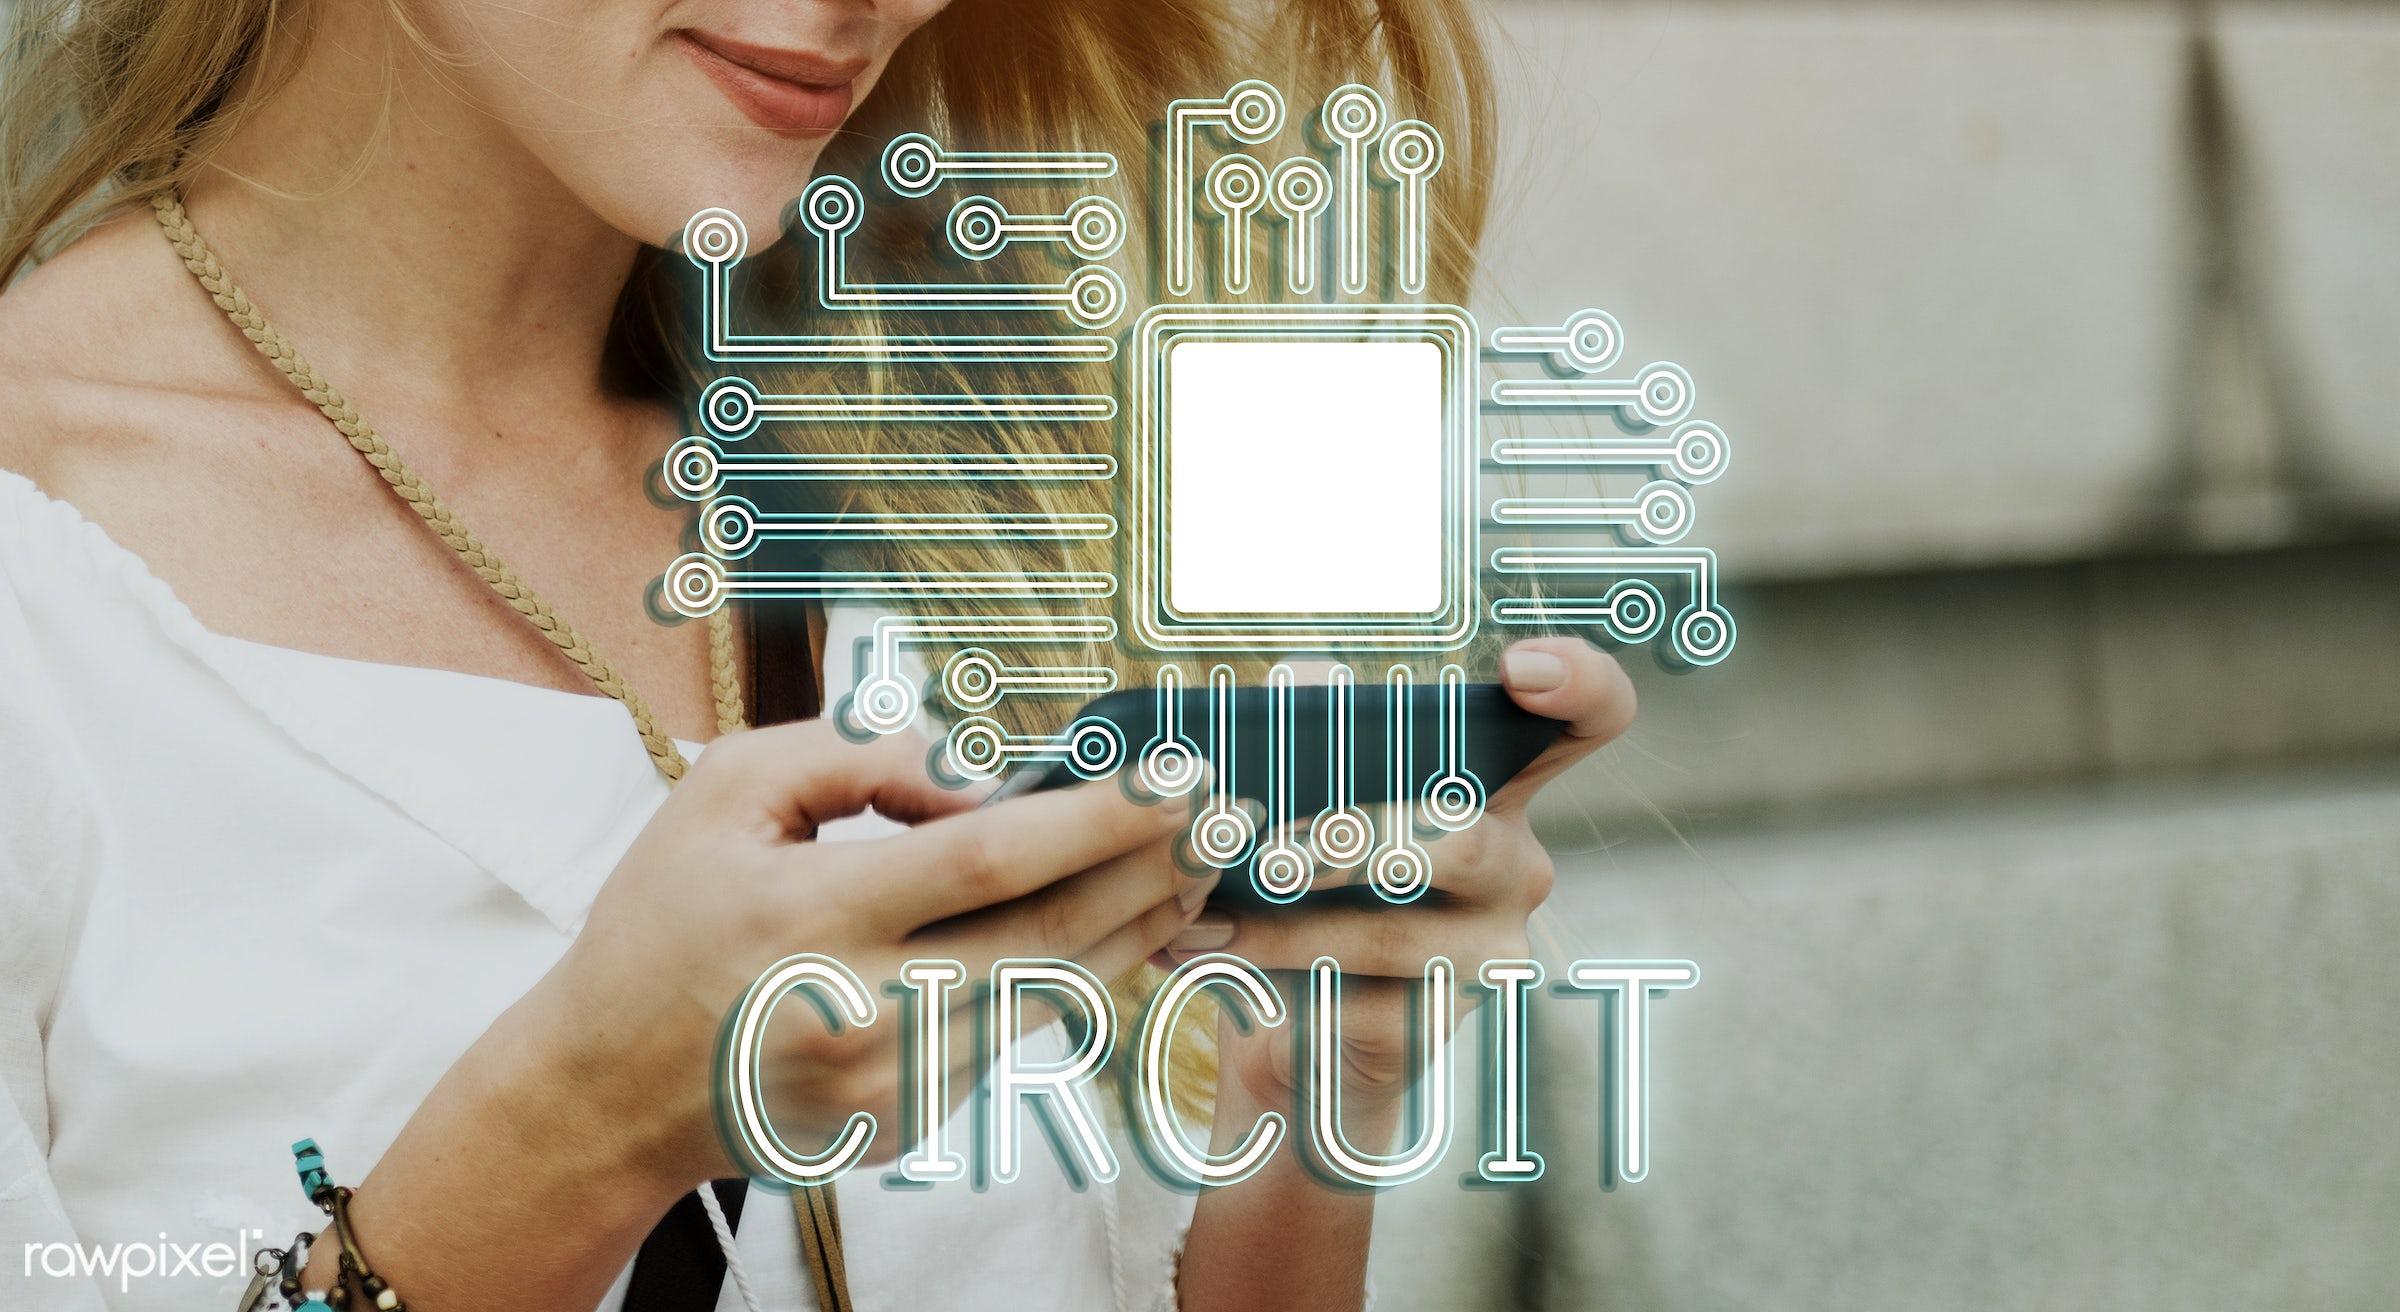 advanced technology, browsing, chat, circuit, communication, connection, data, development, digital, futuristic, go digital...